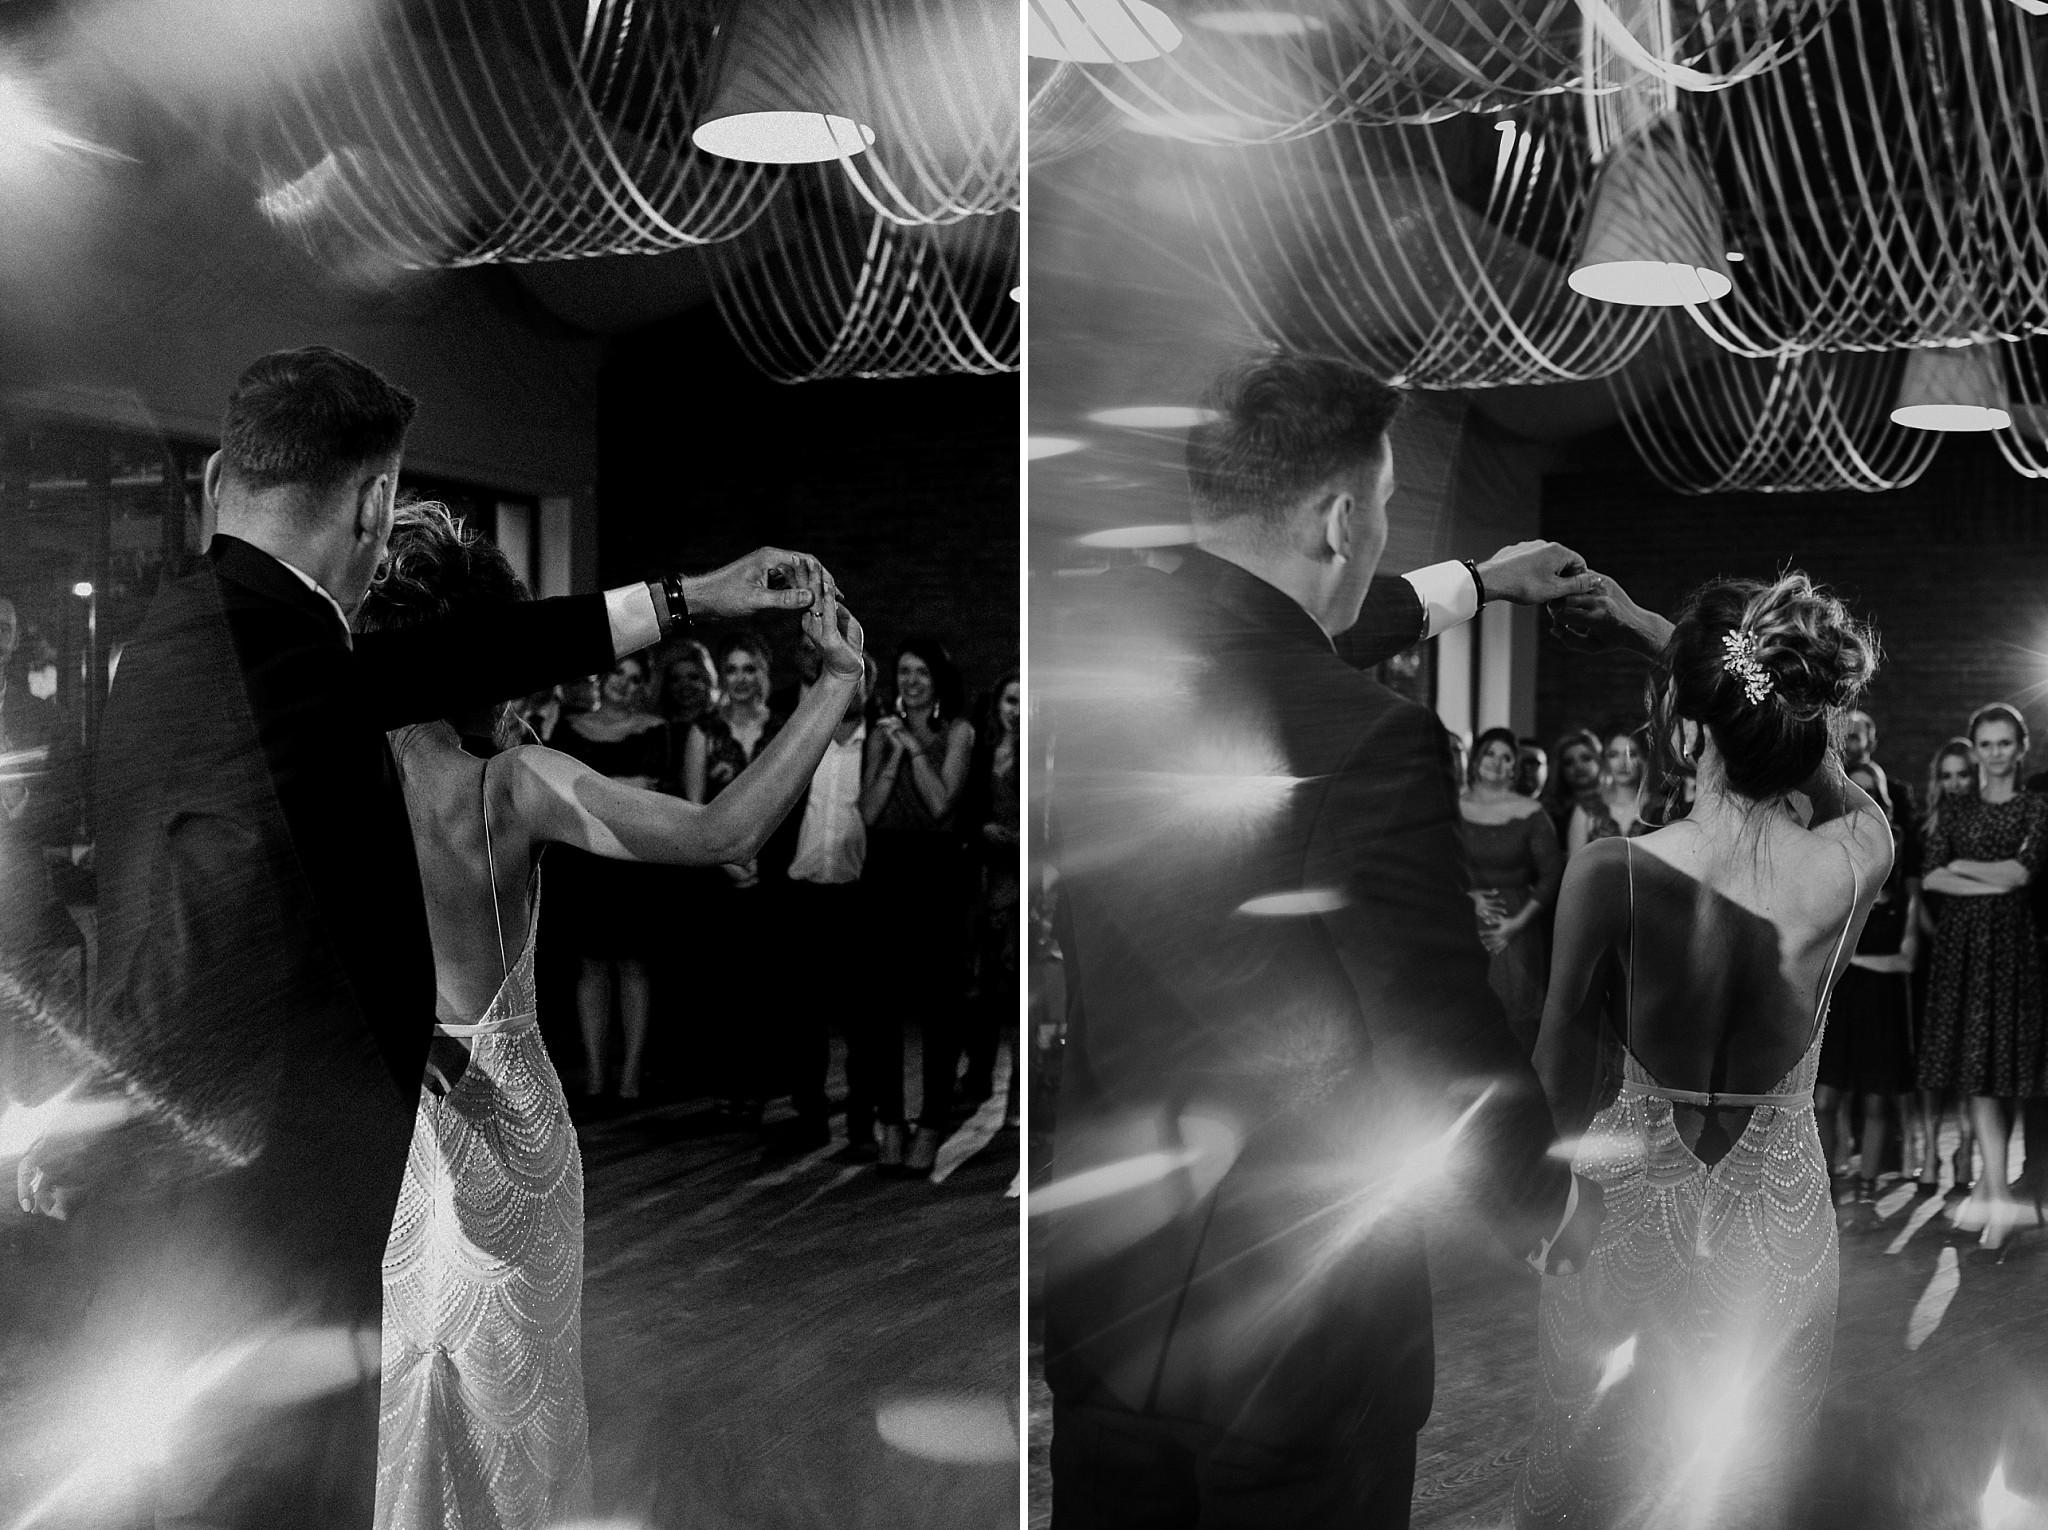 fotograf poznan wesele dobra truskawka piekne wesele pod poznaniem wesele w dobrej truskawce piekna para mloda slub marzen slub koronawirus slub listopad wesele koronawirus 314